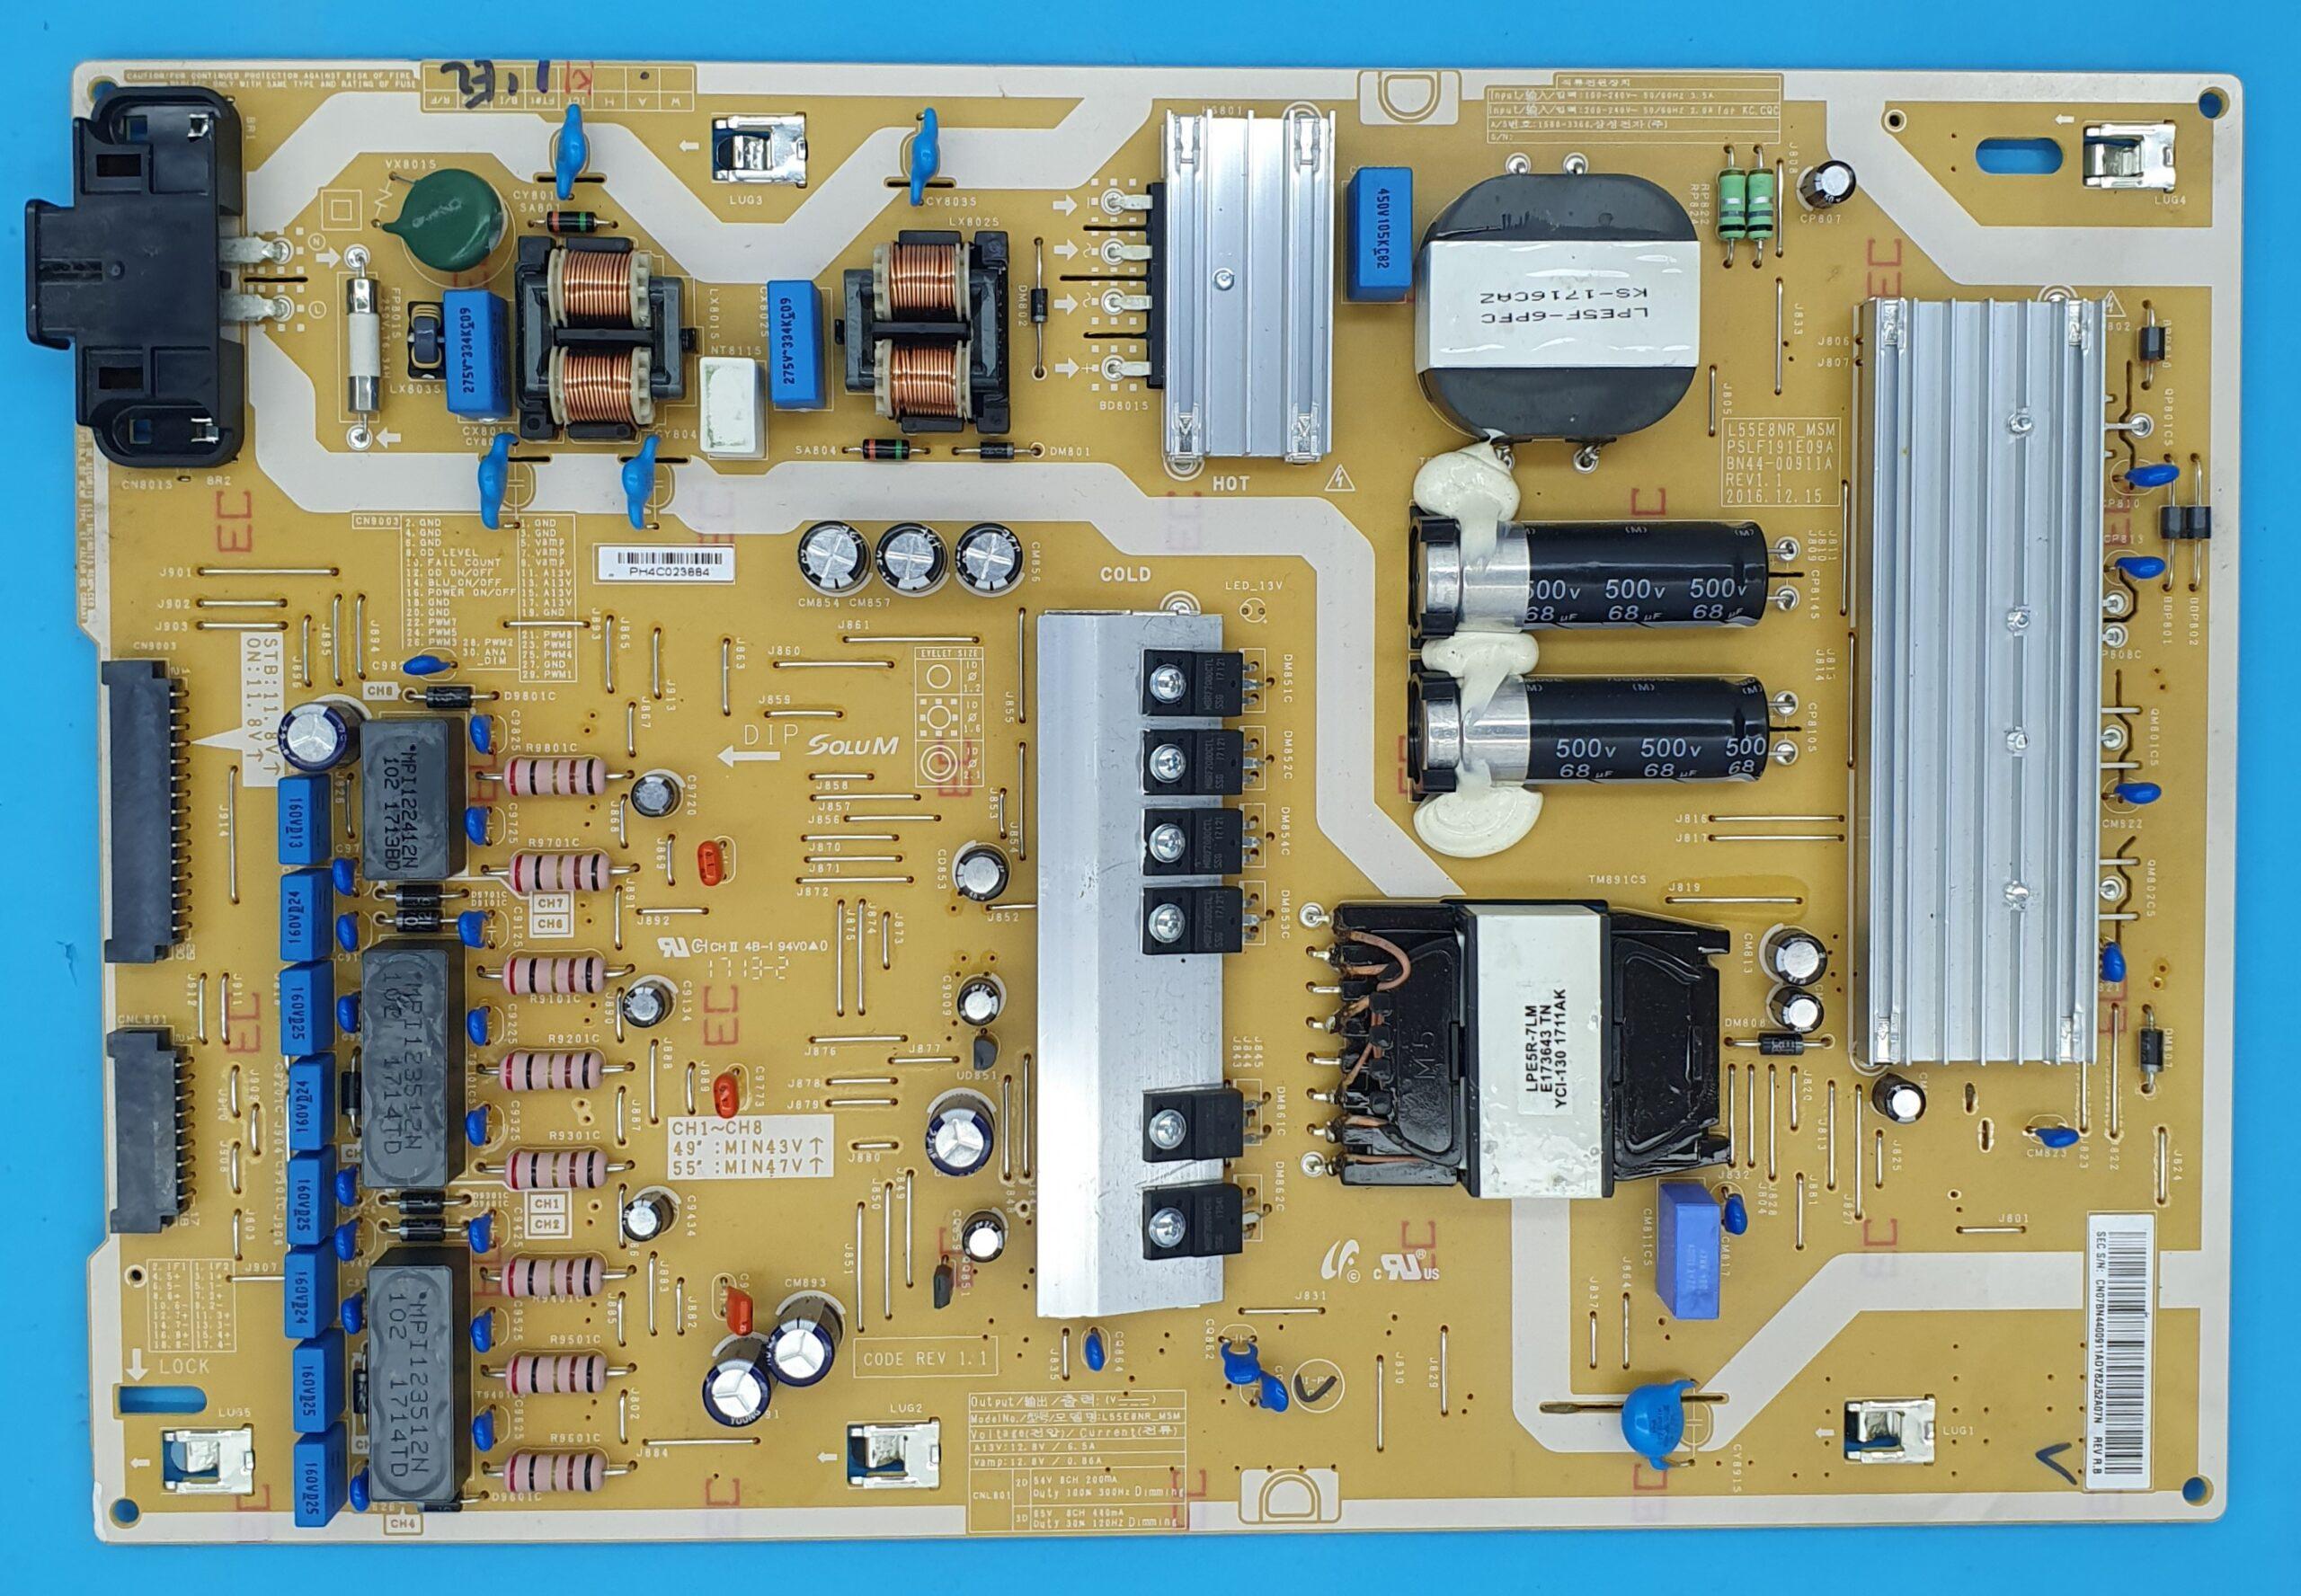 BN44-00911A Samsung Power (KDV DAHİL = 300 TL)